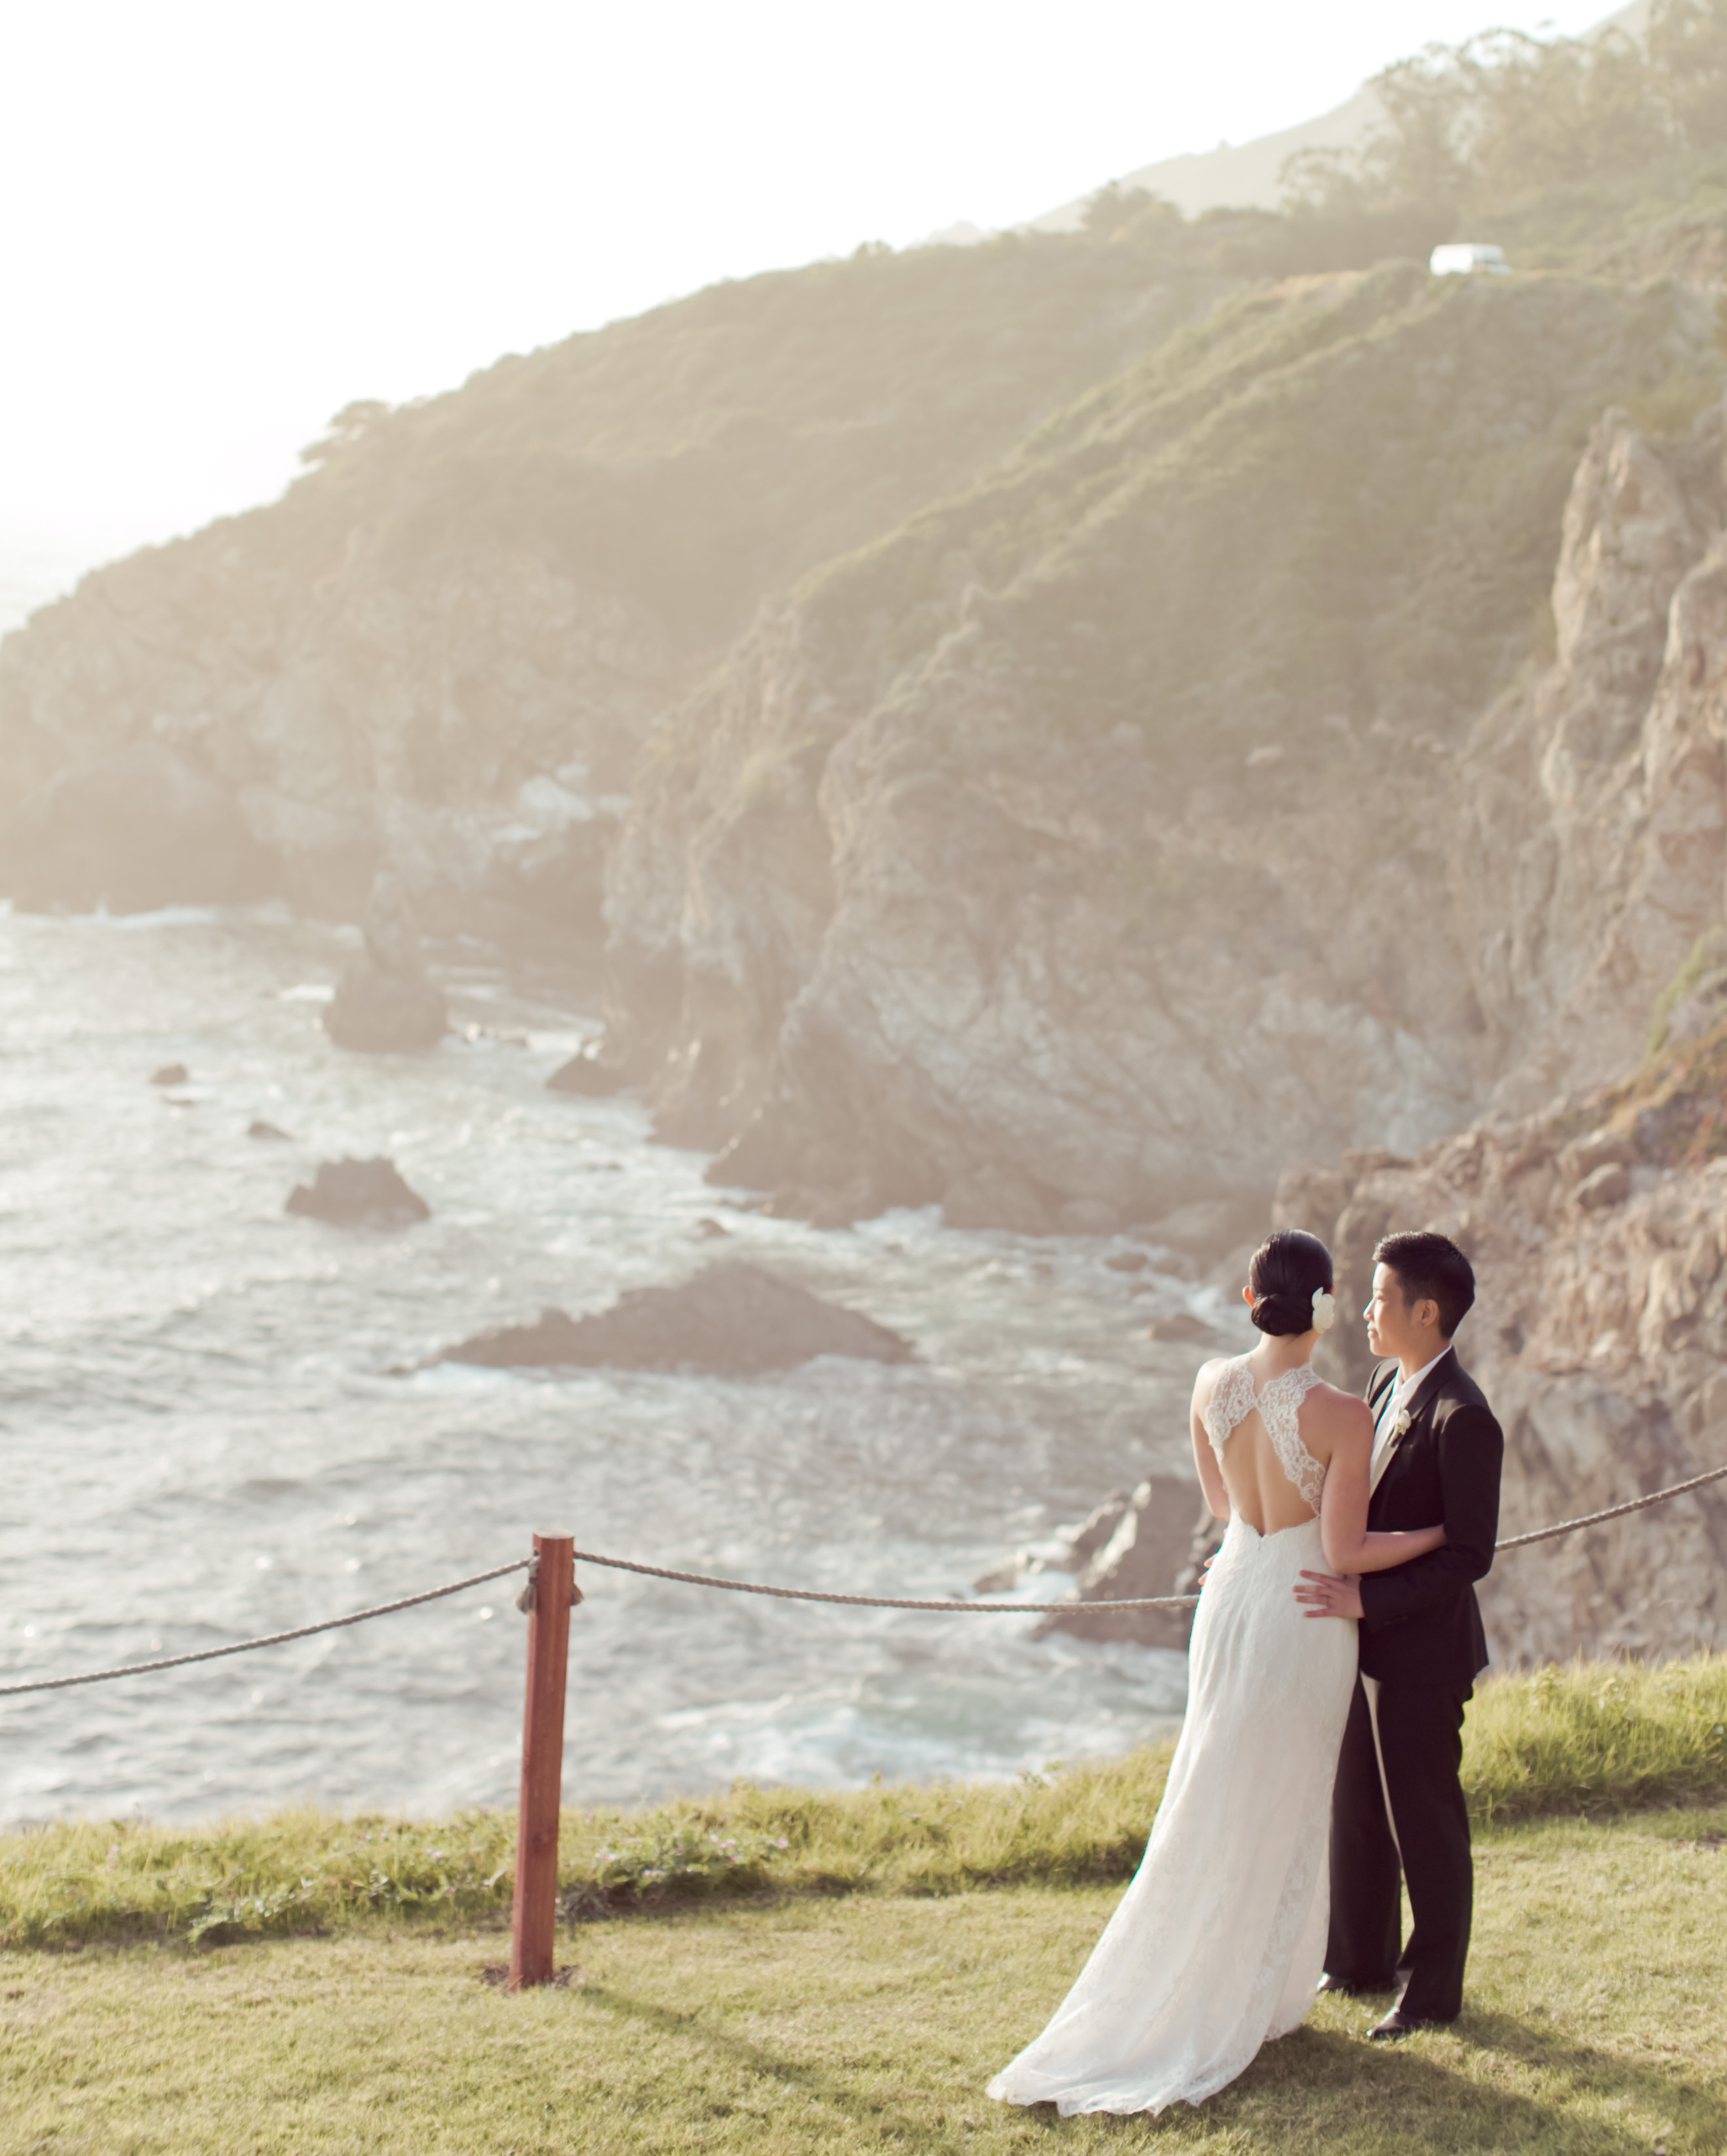 emma-michelle-wedding-couple-1197-s112079-0715.jpg